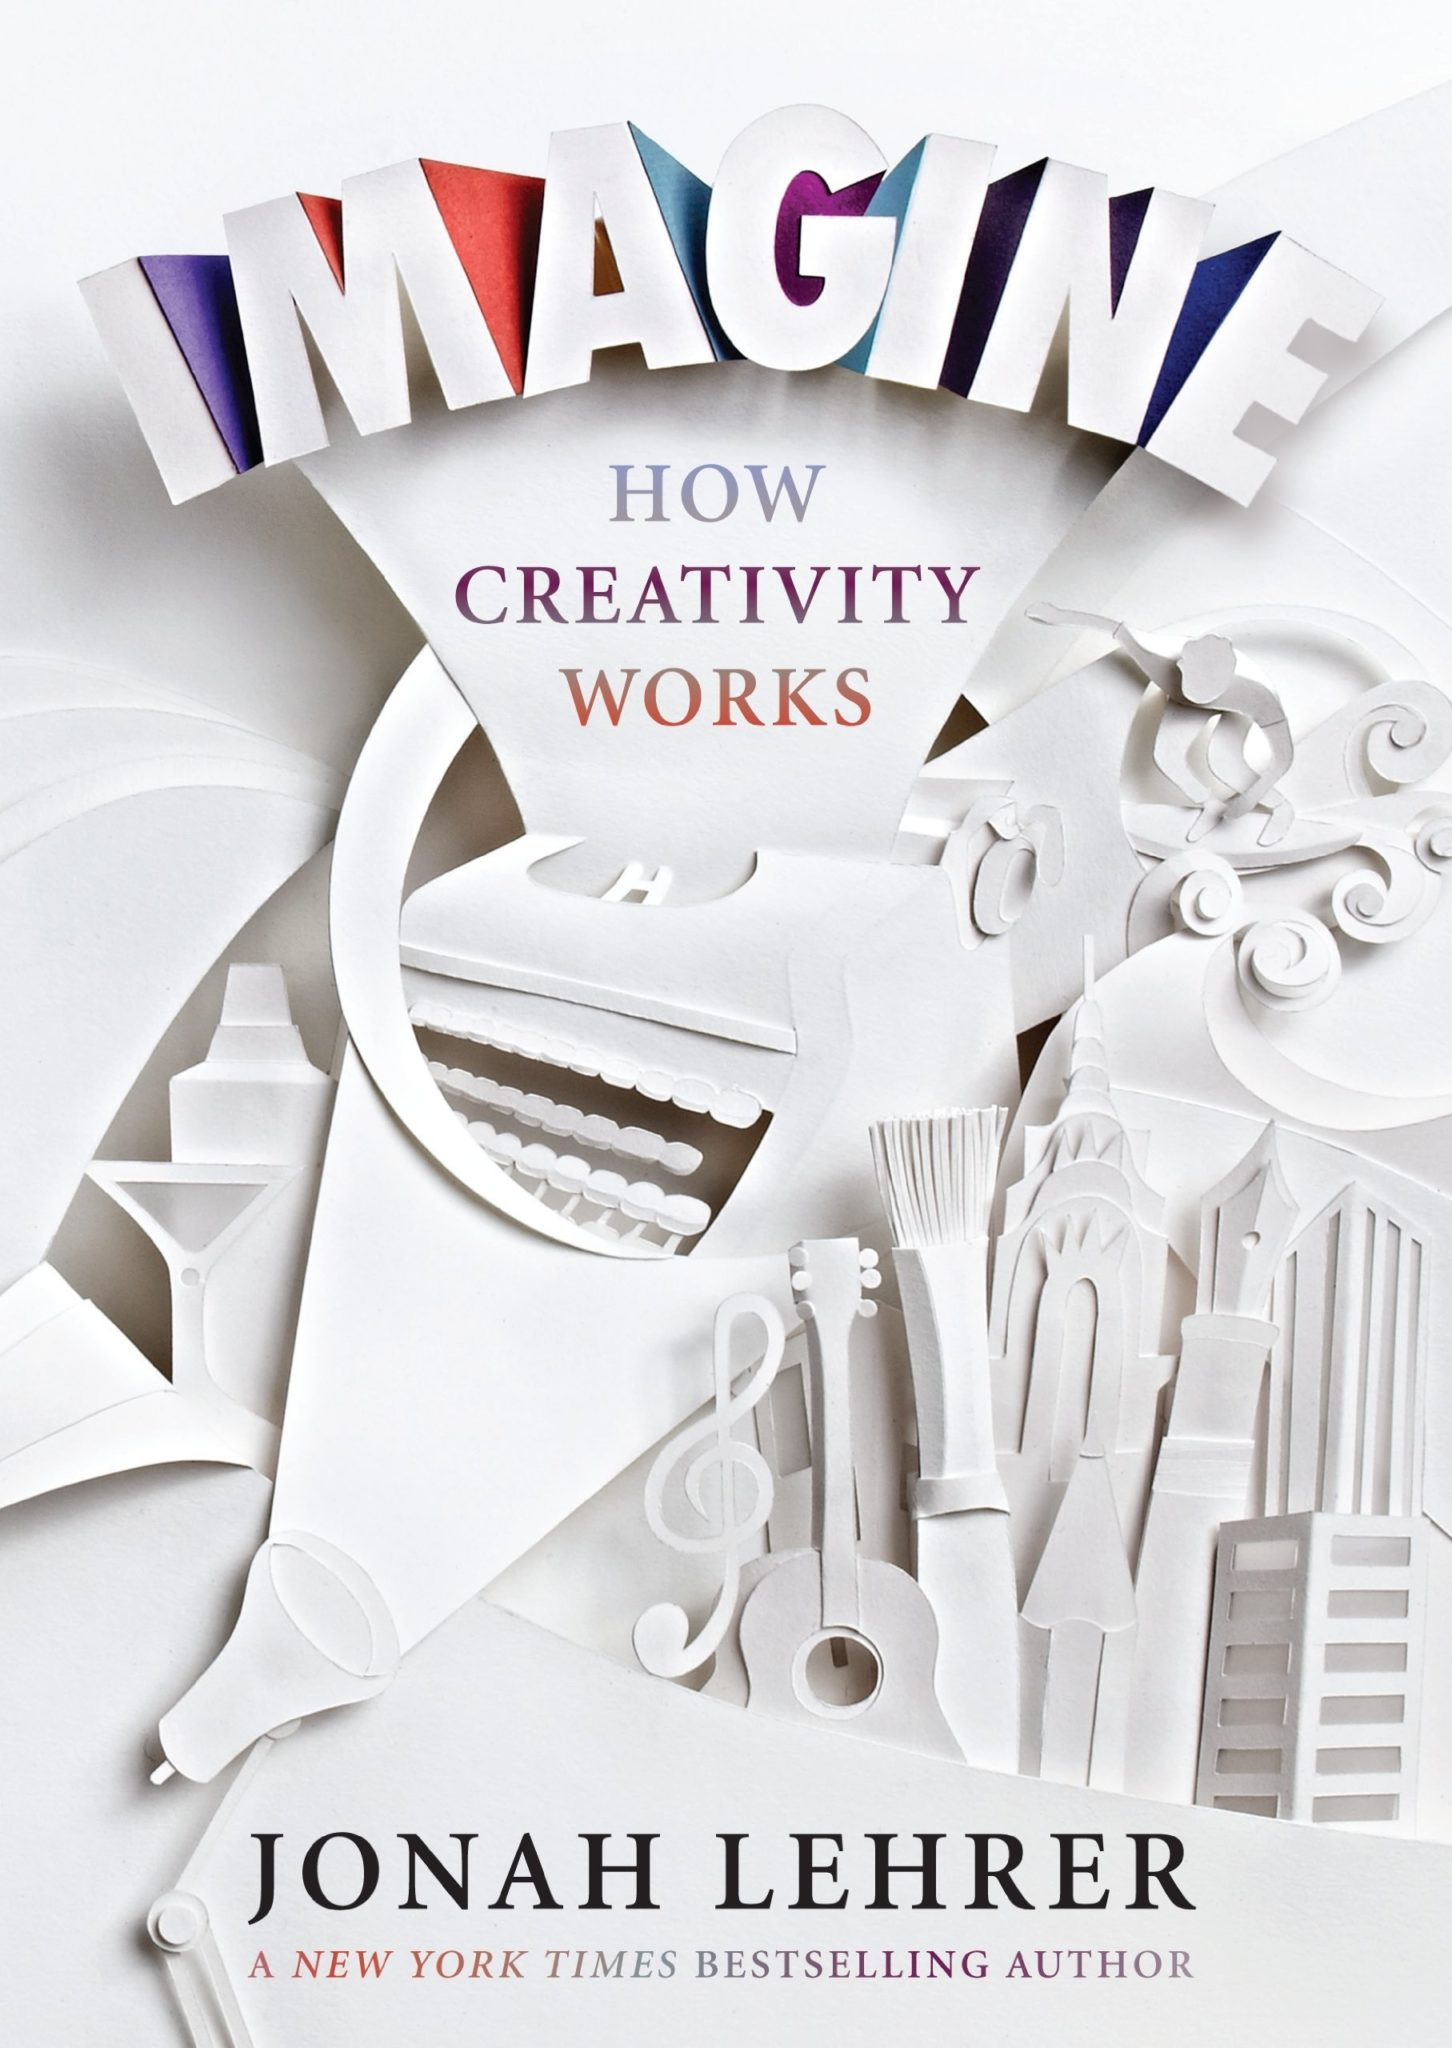 Imagine. How creativity works.